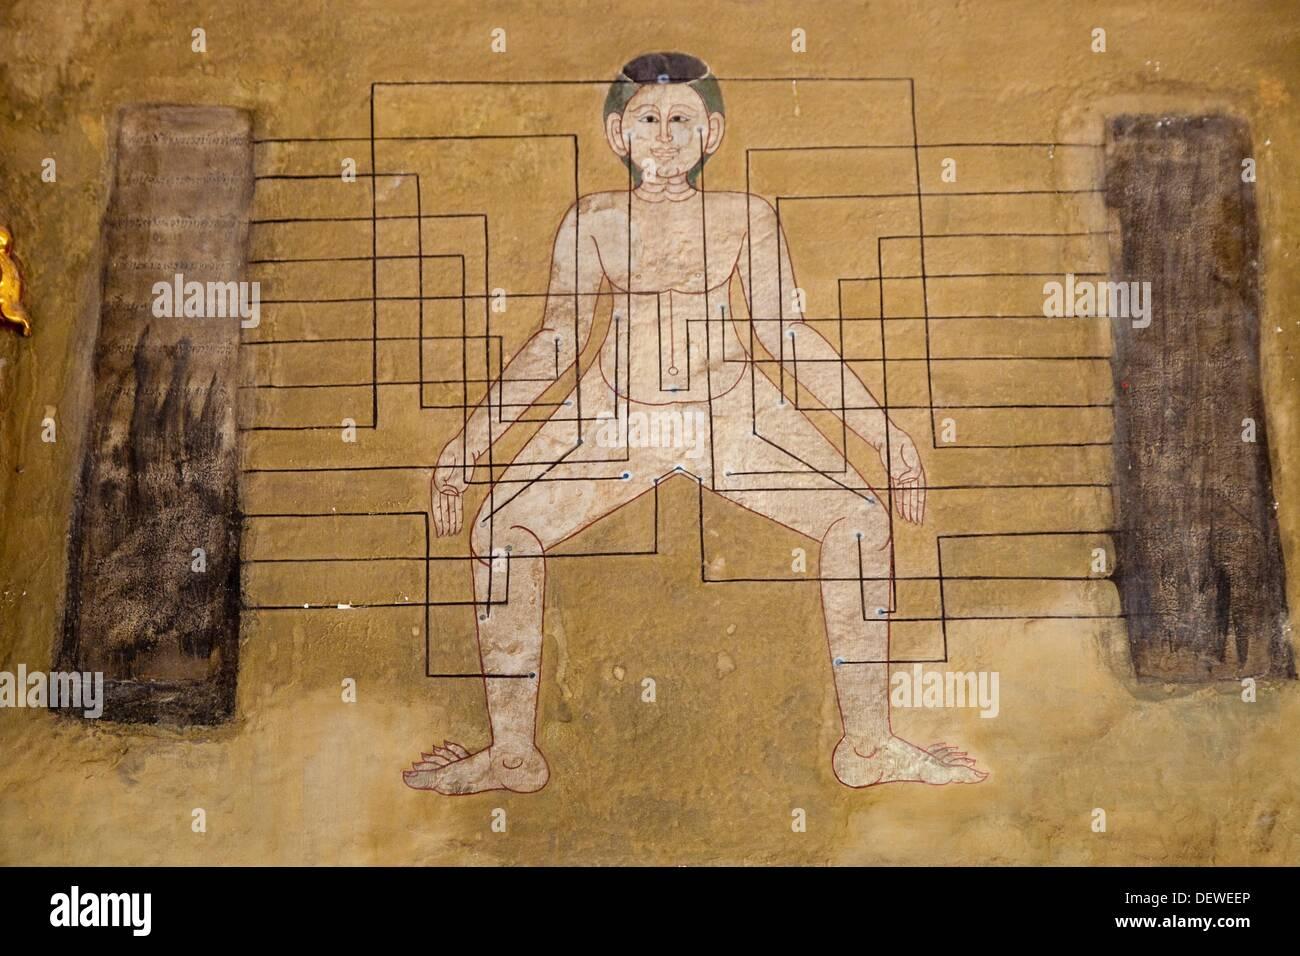 Wat Pho Thai Traditional Medical and Massage School  Bangkok, Thailand, Southeast Asia, Asia. - Stock Image